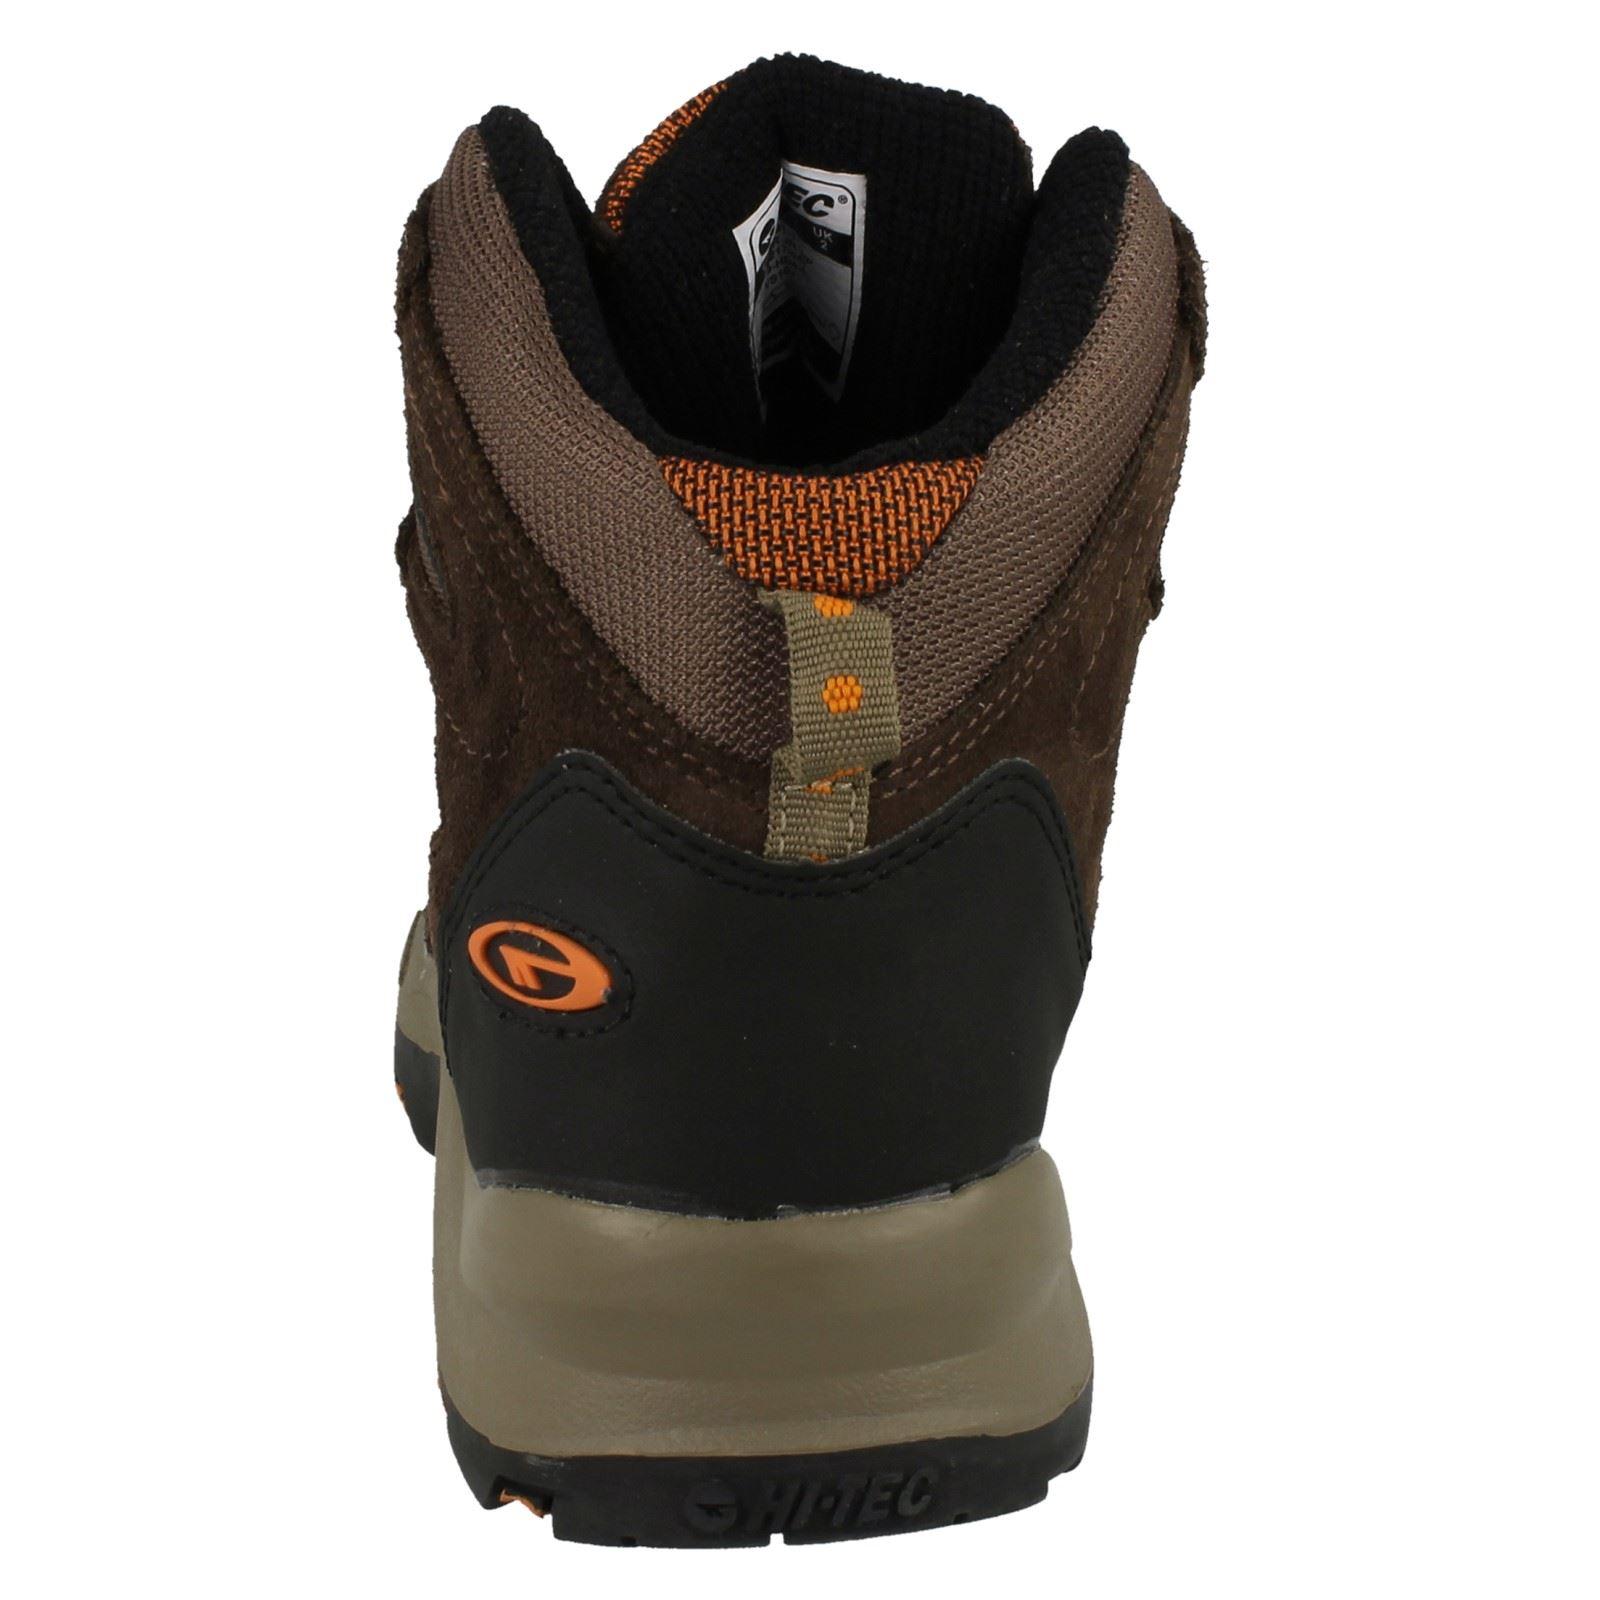 Boys Hi-Tec Casual Waterproof Lace Up Walking Boots Kruger Jr